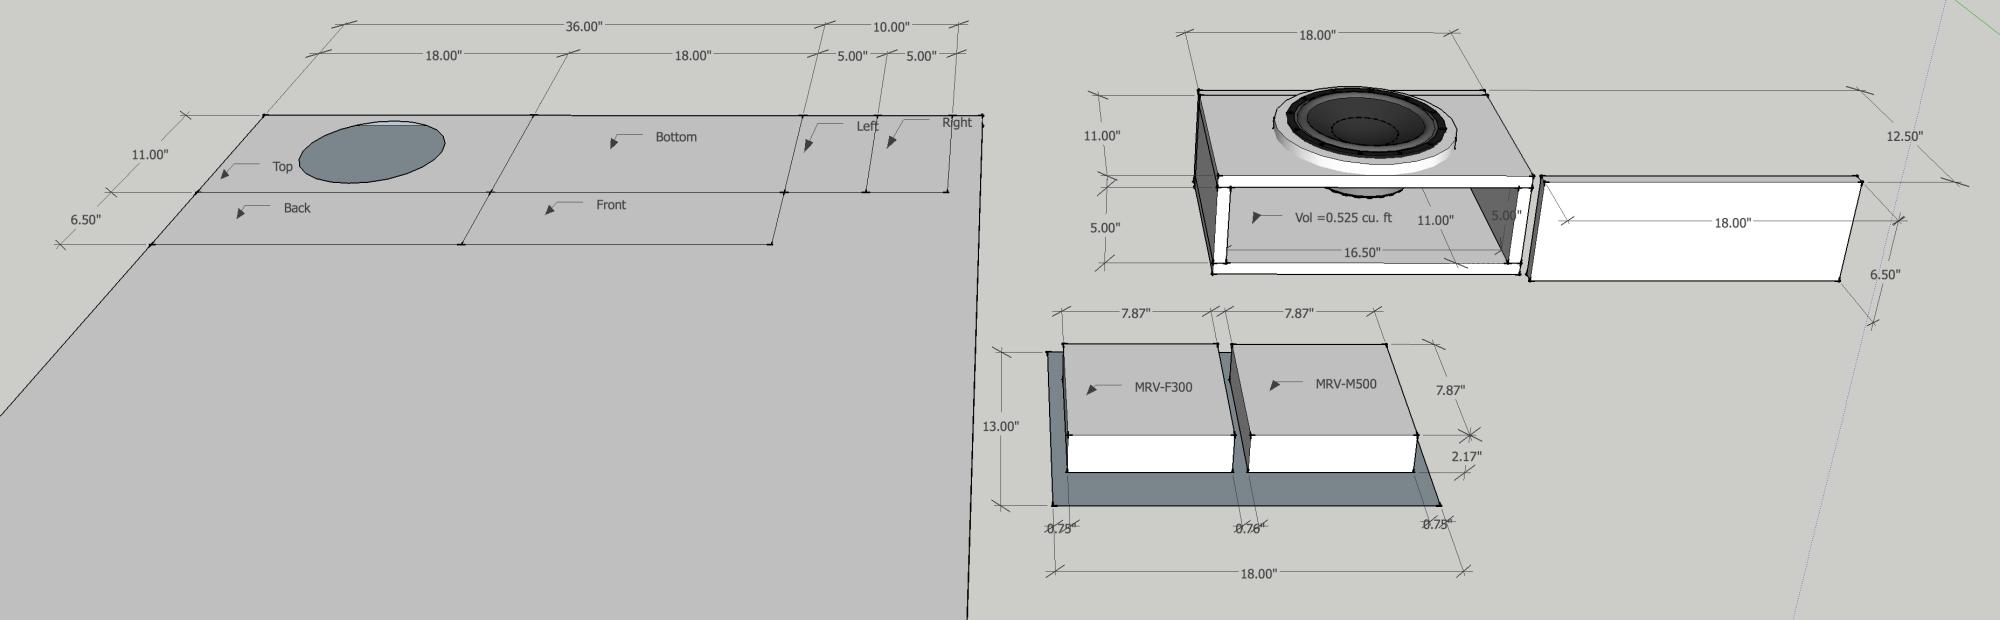 hight resolution of kenwood ddx470 alpine mrv f300 mrv m500 sps 610c